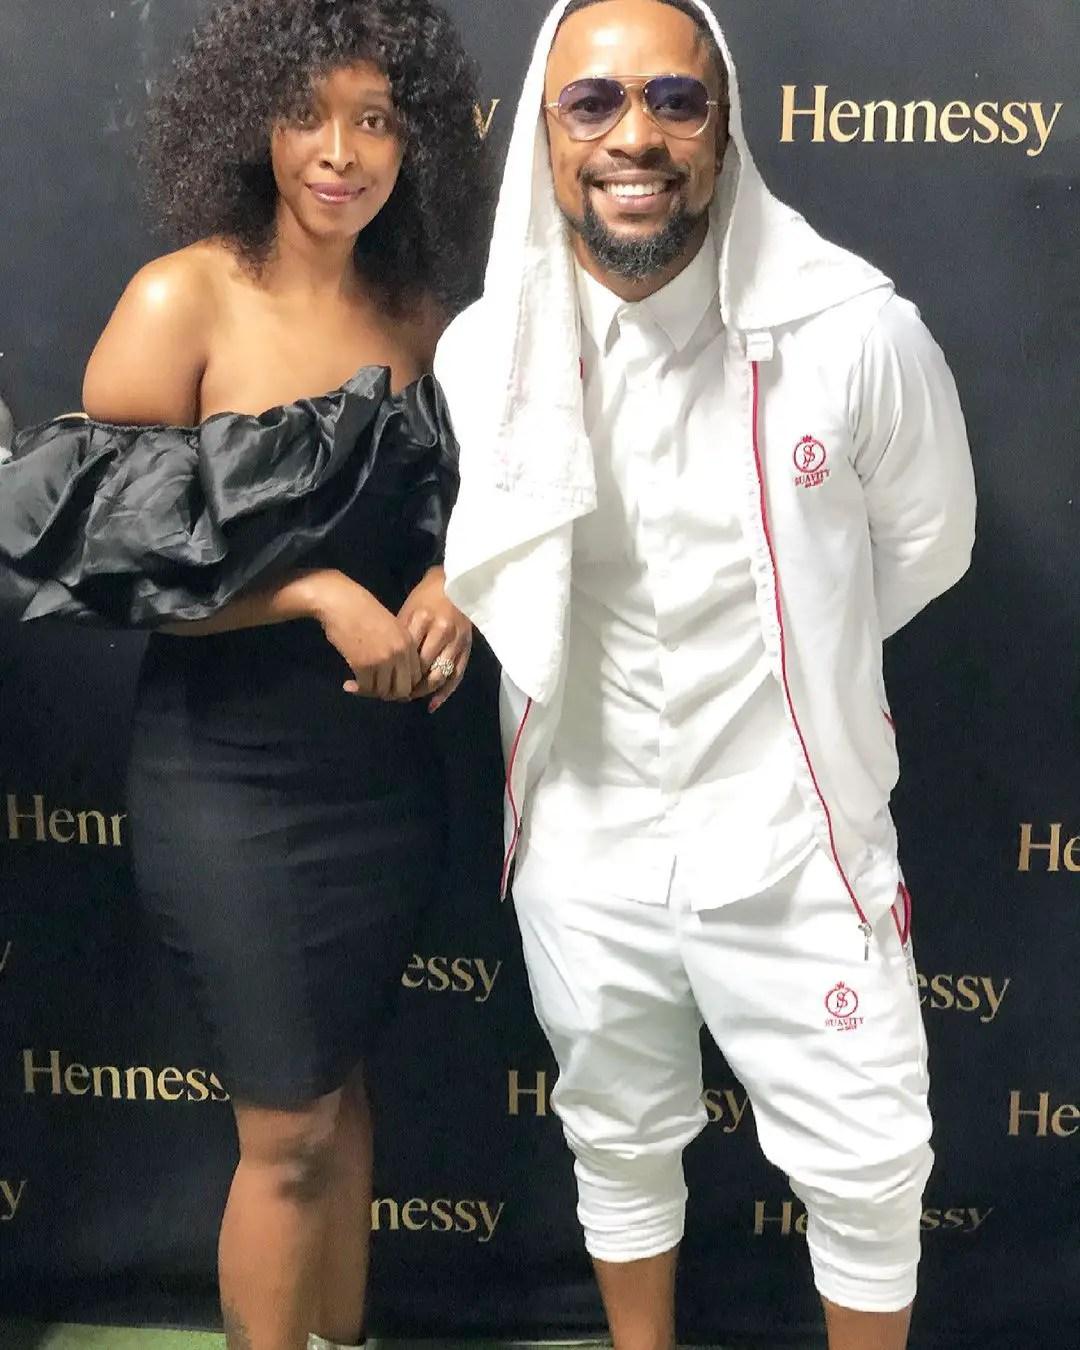 SK Khoza and his fiancé Mandy Hlongwane